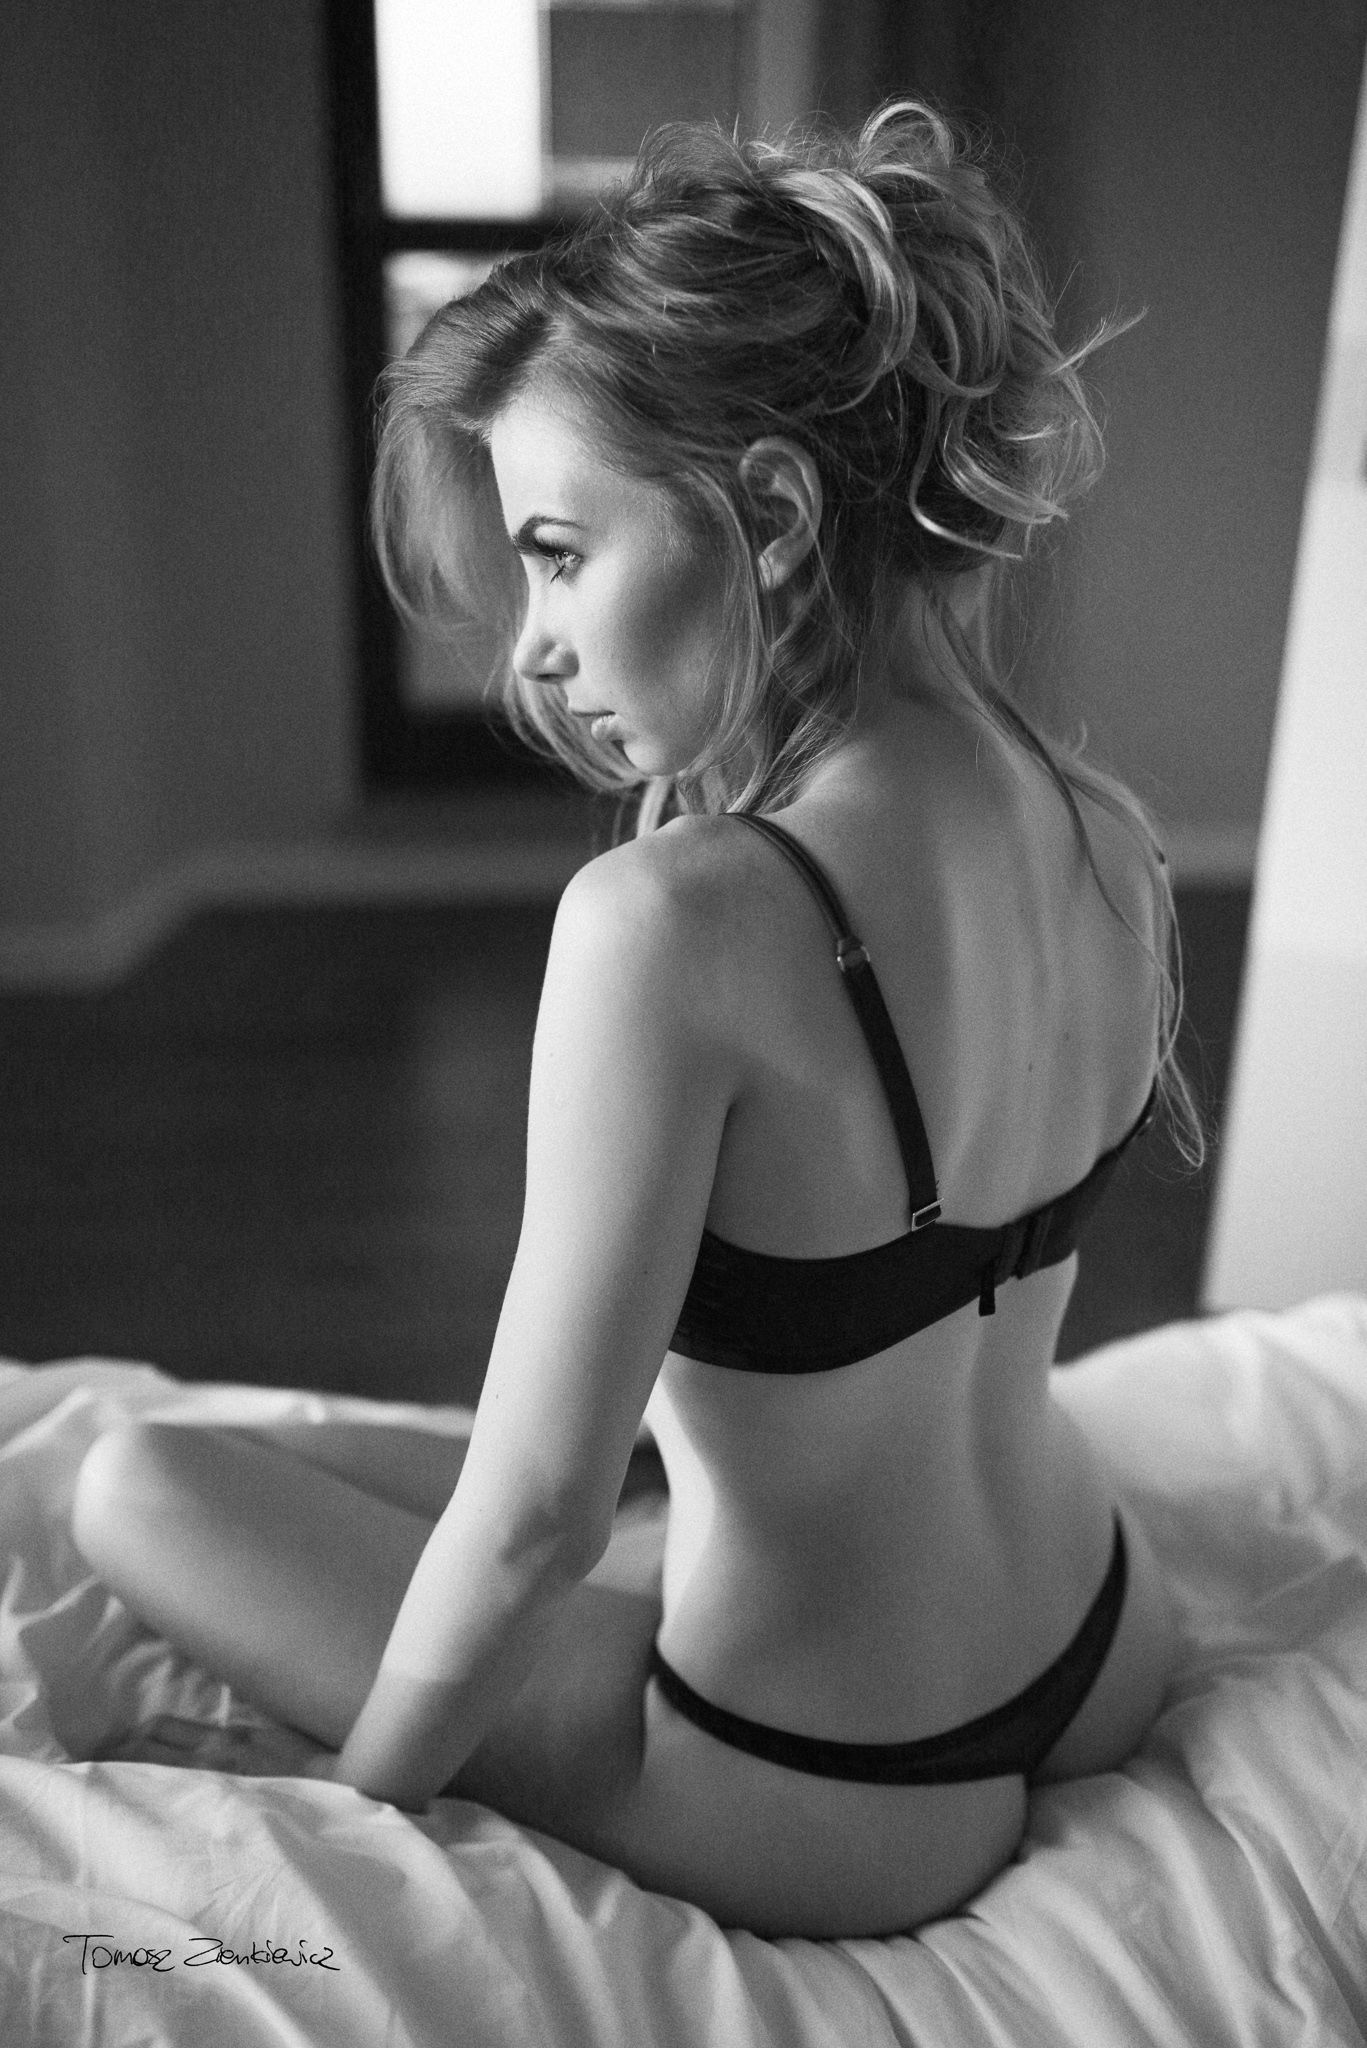 lingerie Images Colette Laporta naked photo 2017